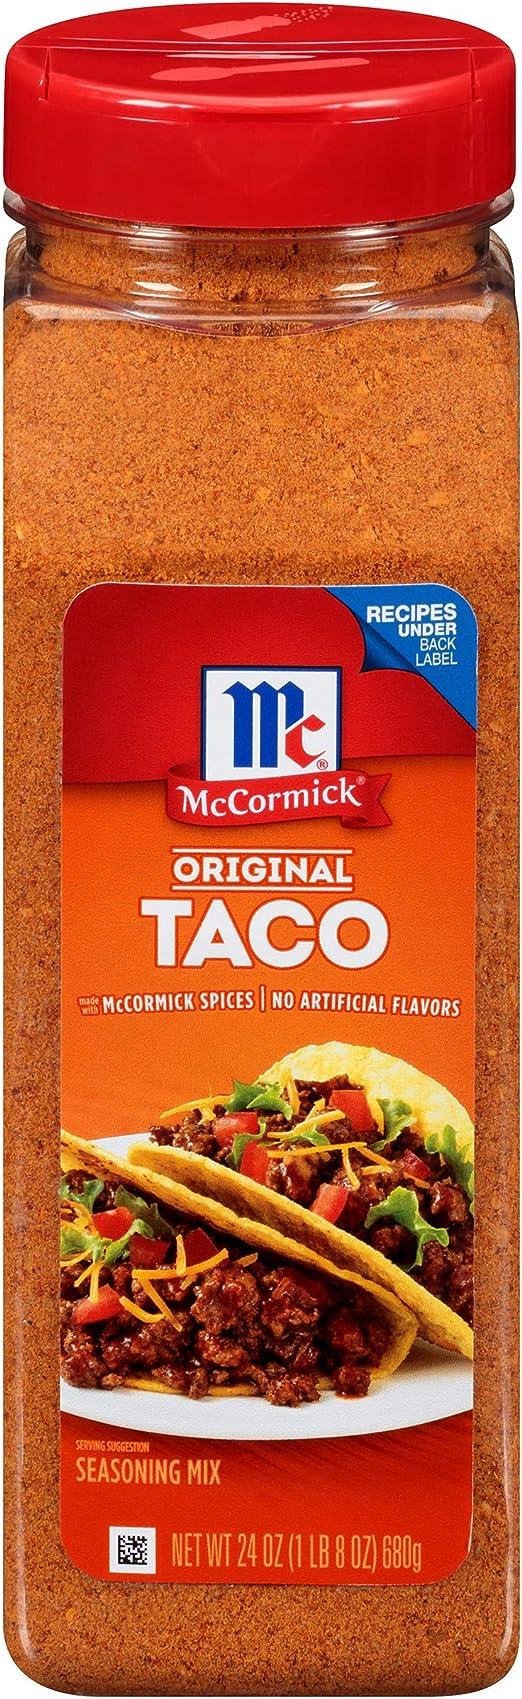 Mccormick Original Taco Seasoning Mix 680g Tub Amazon Co Uk Grocery